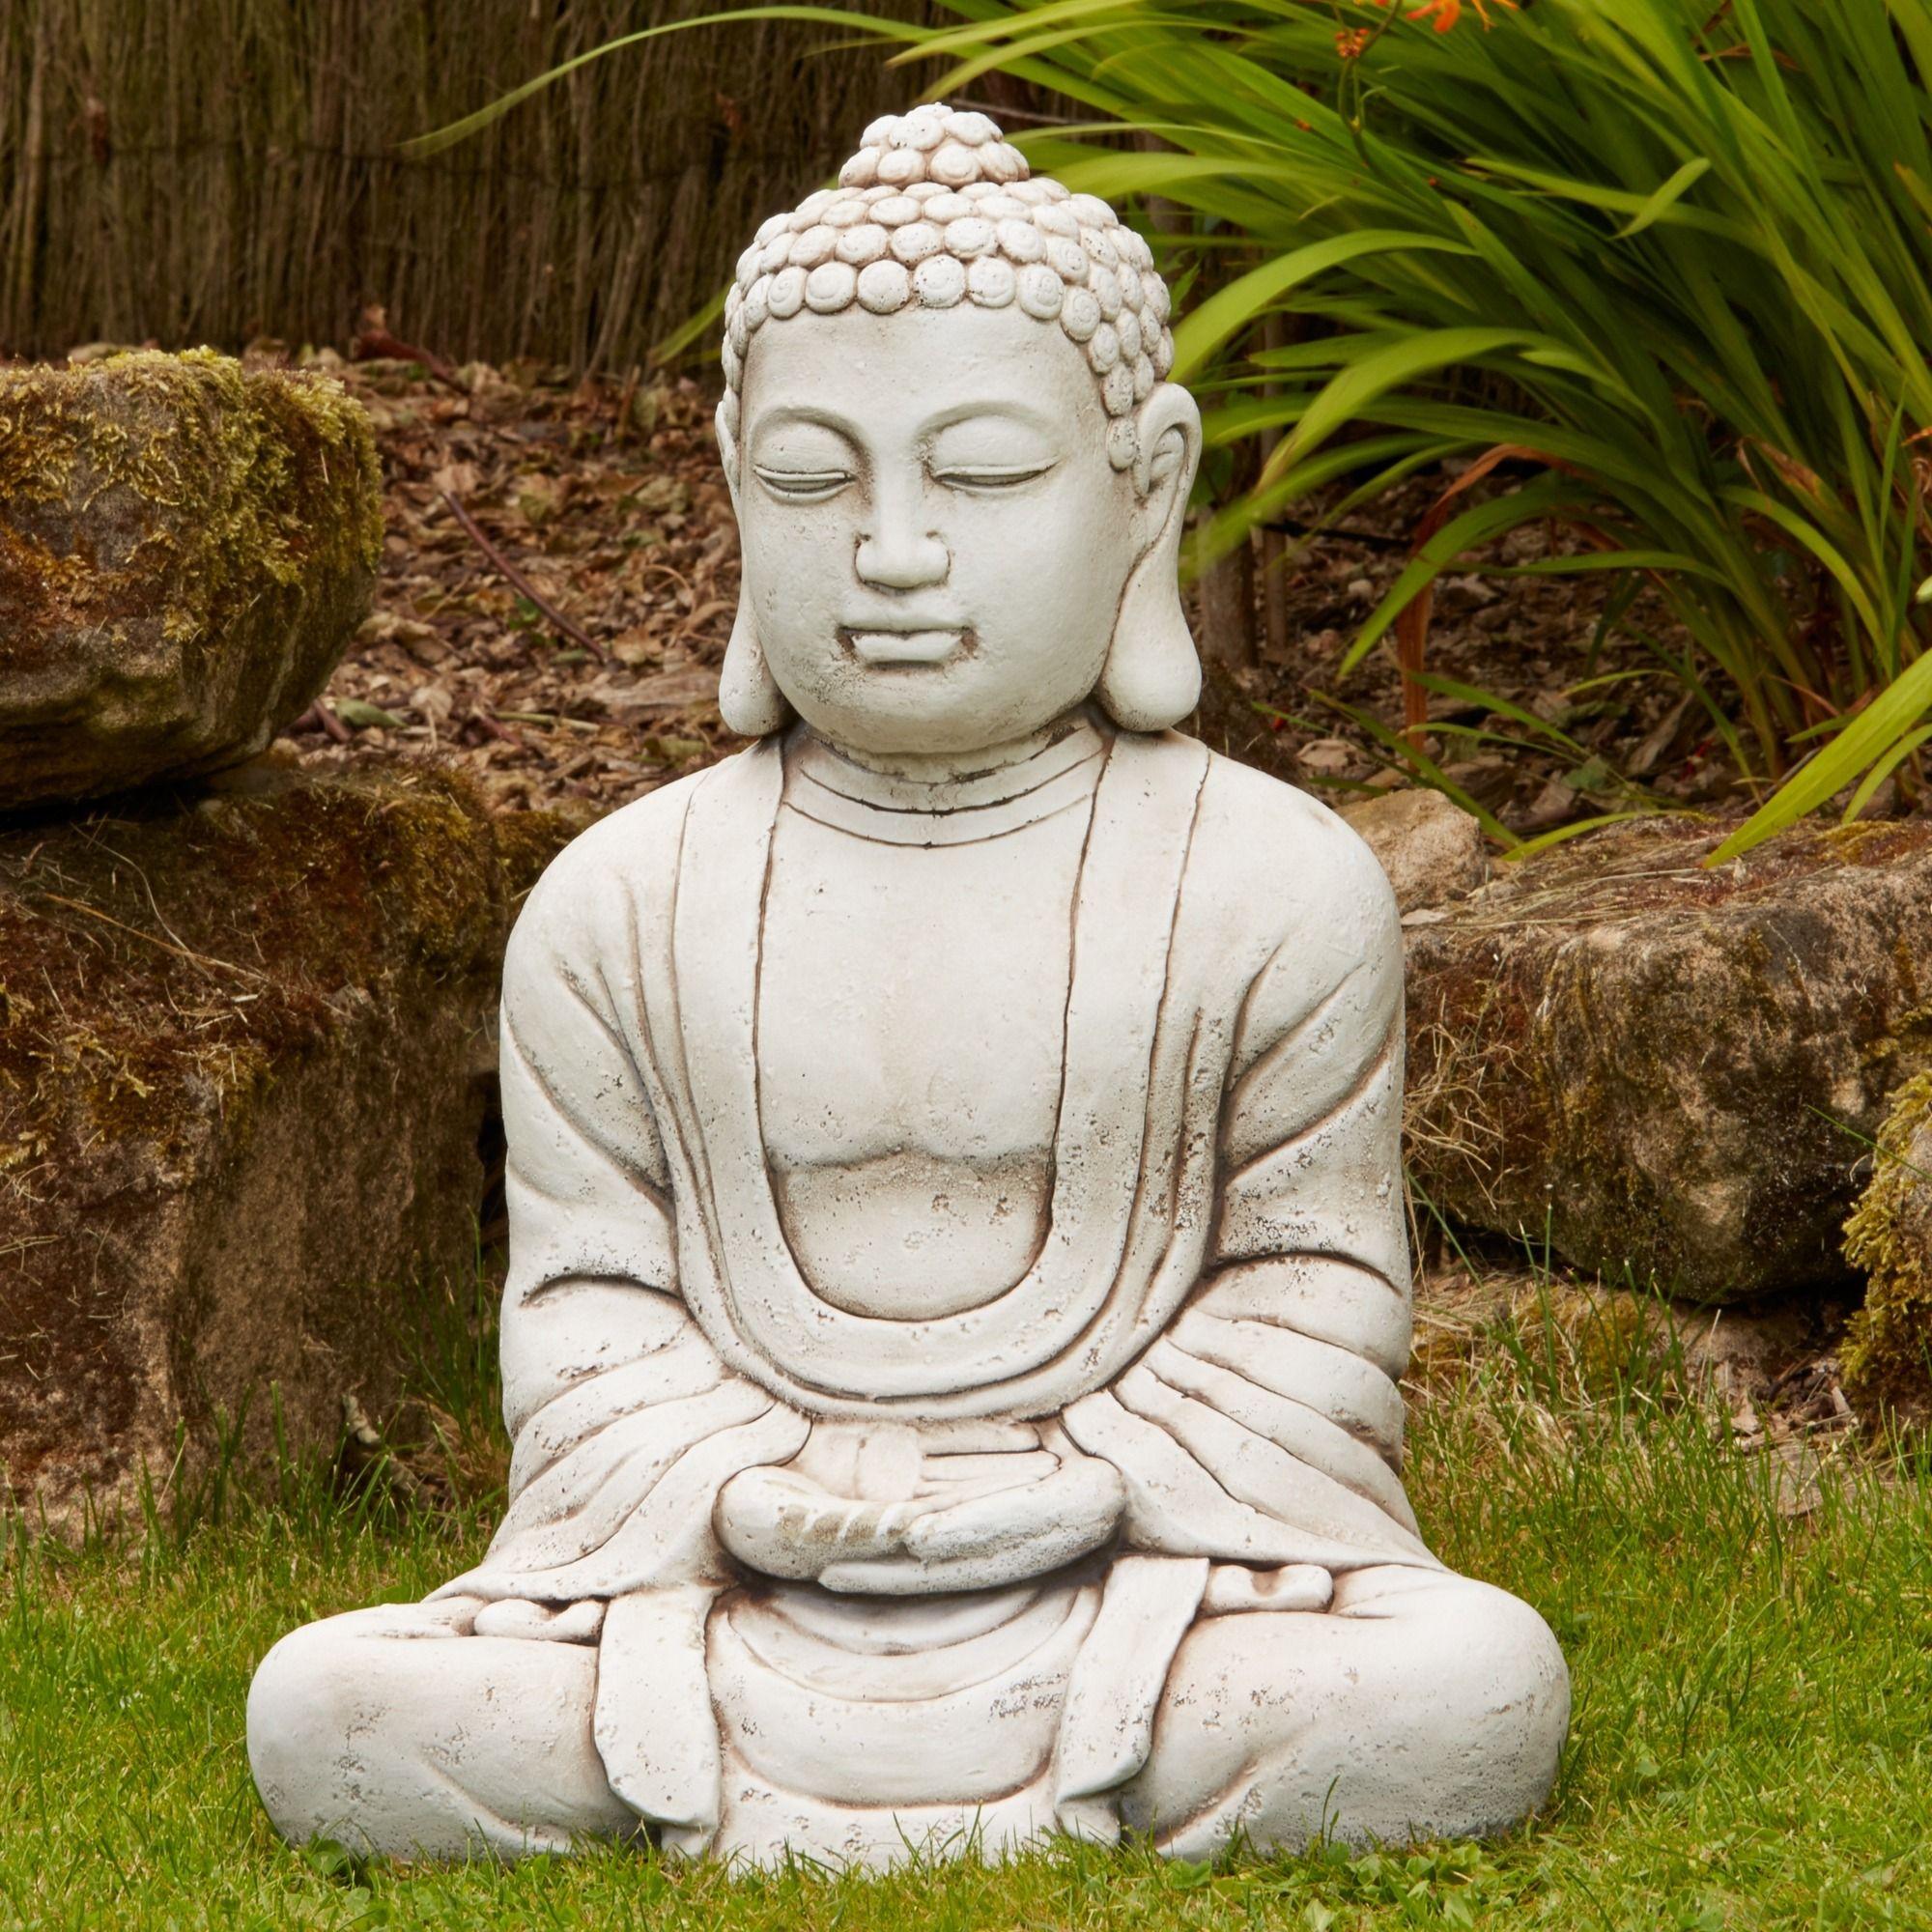 Hindu Stone Buddha Statue Large Garden Ornament